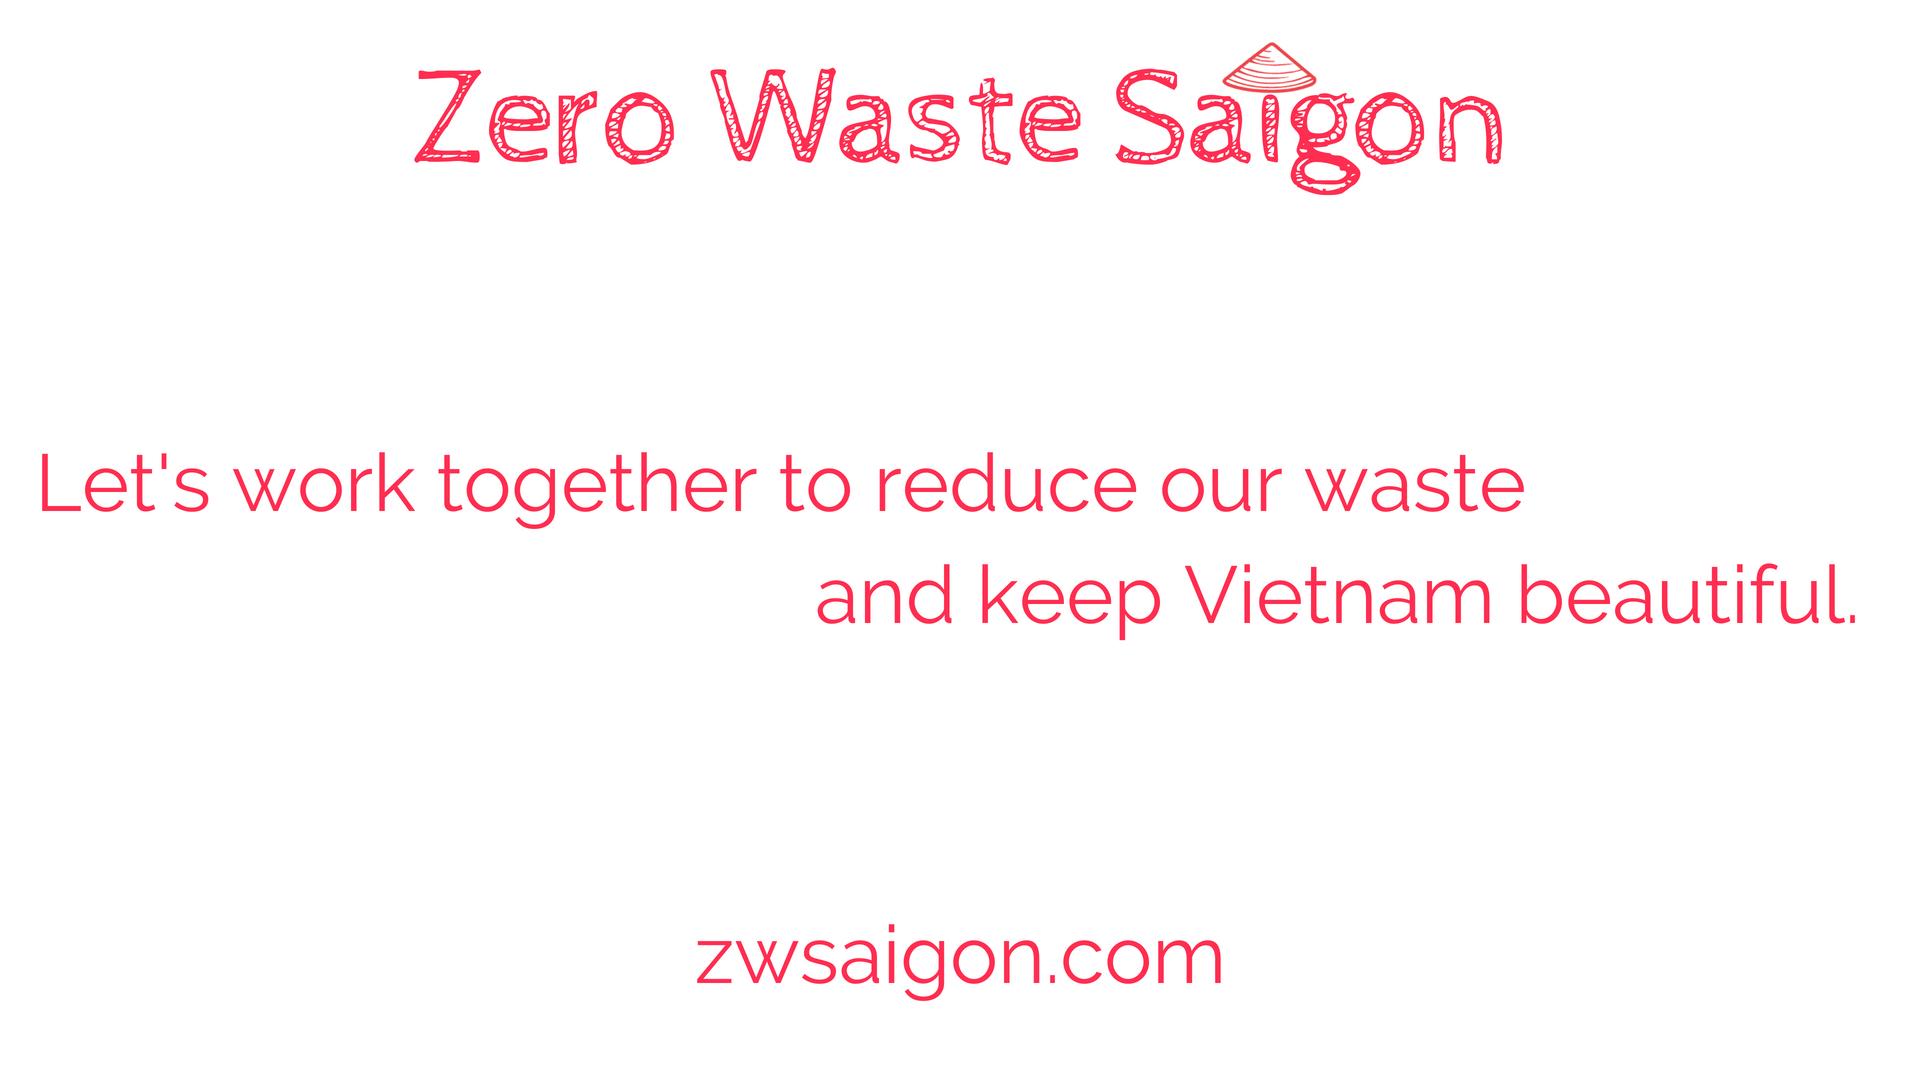 Zero Waste Saigon presentation slide 1